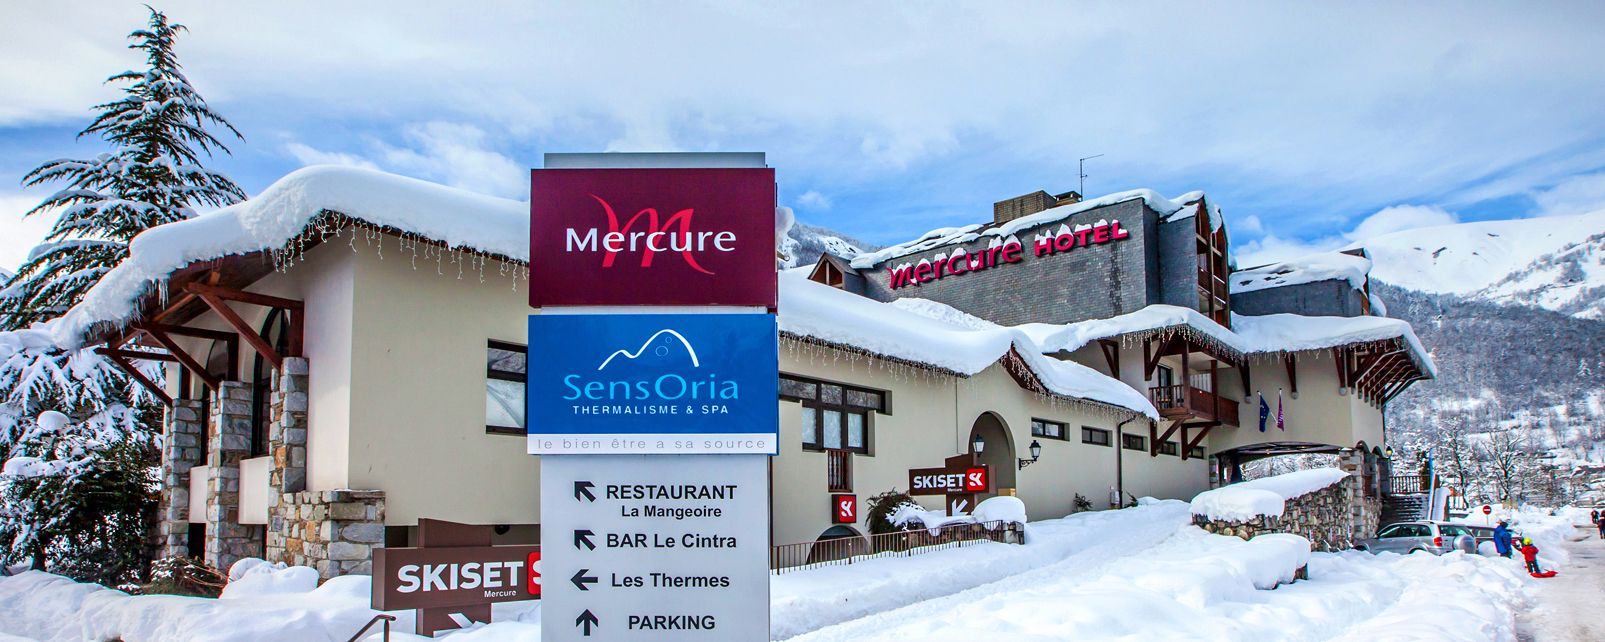 Hôtel Mercure Sensoria St Lary